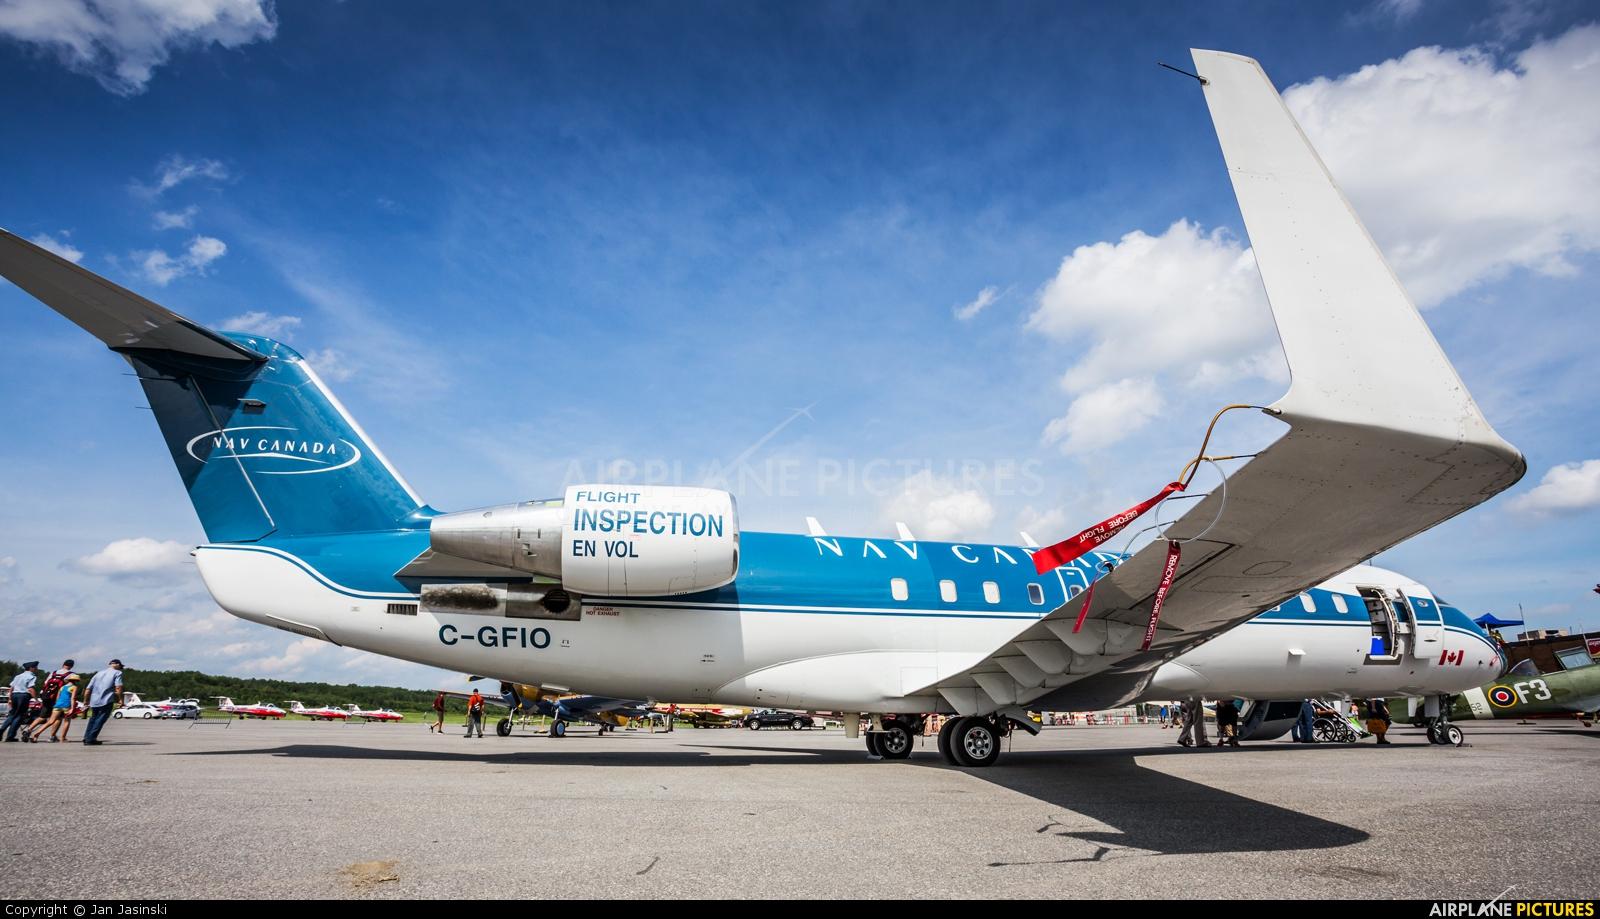 Nav Canada C-GFIO aircraft at Gatineau-Ottawa Exec, ON